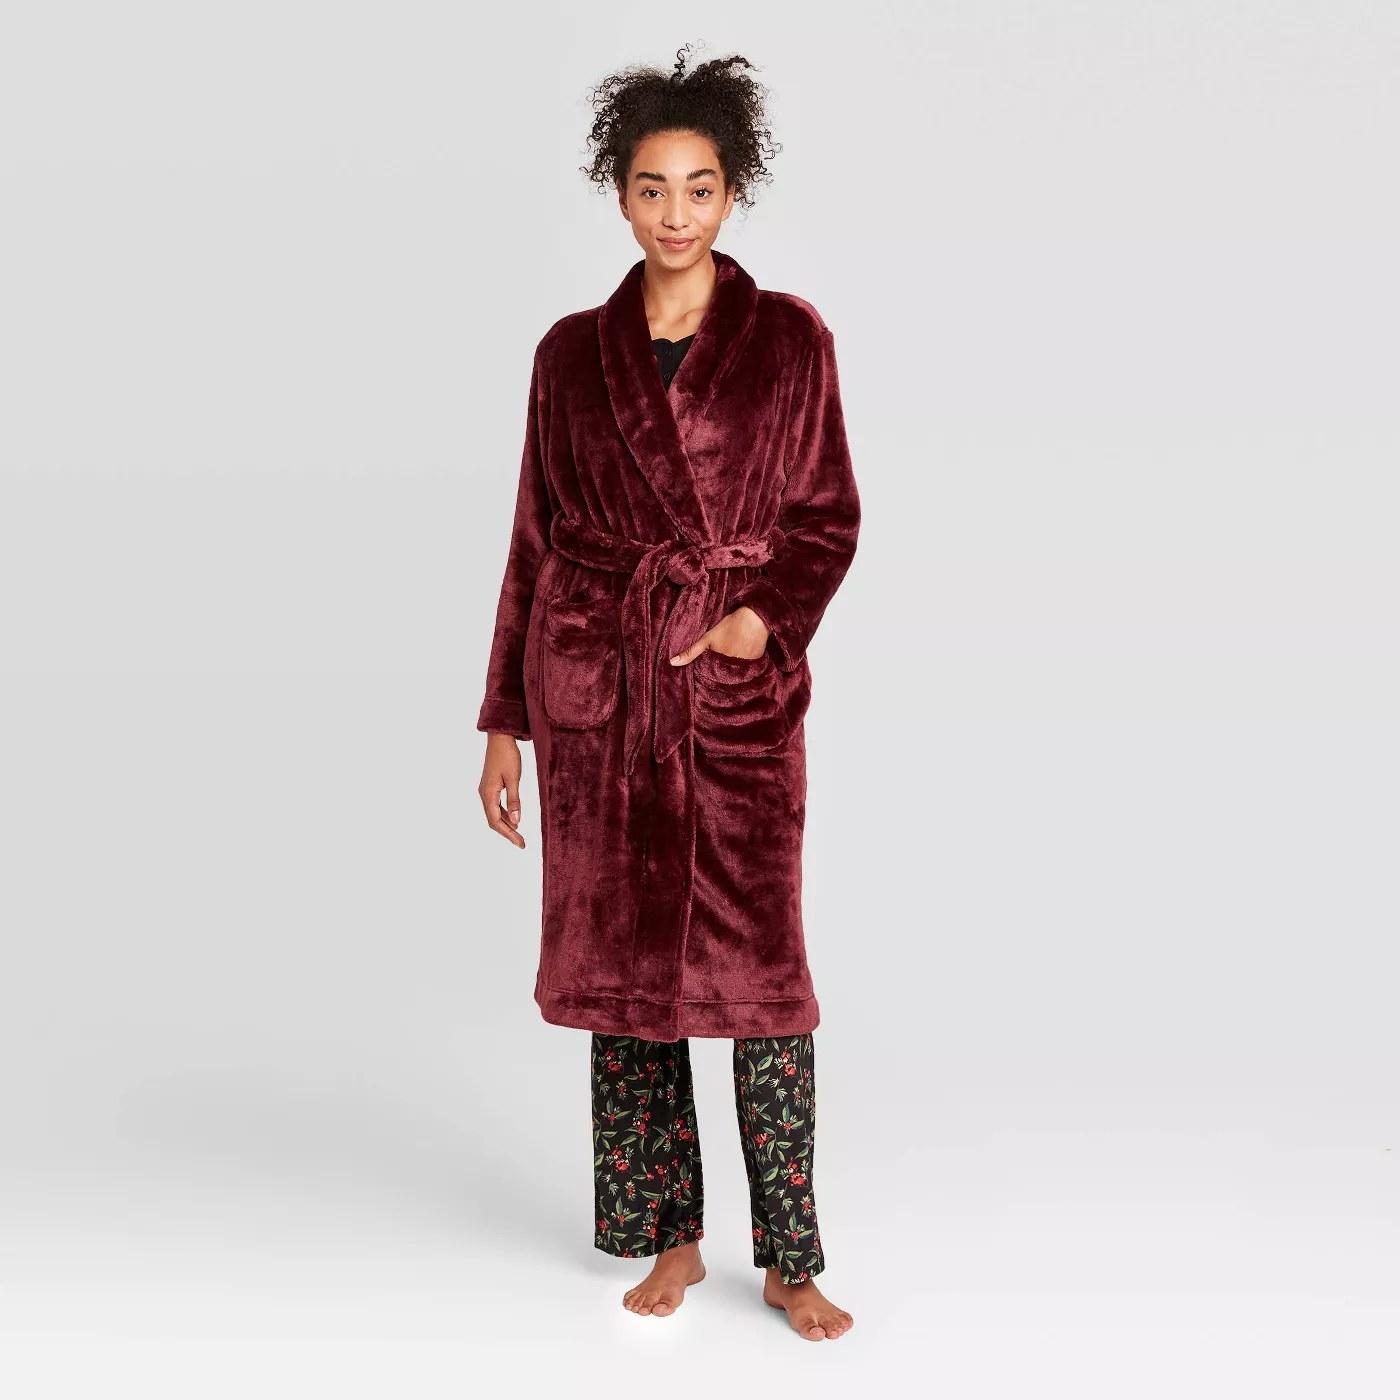 A long sleeve knee length burgundy robe.